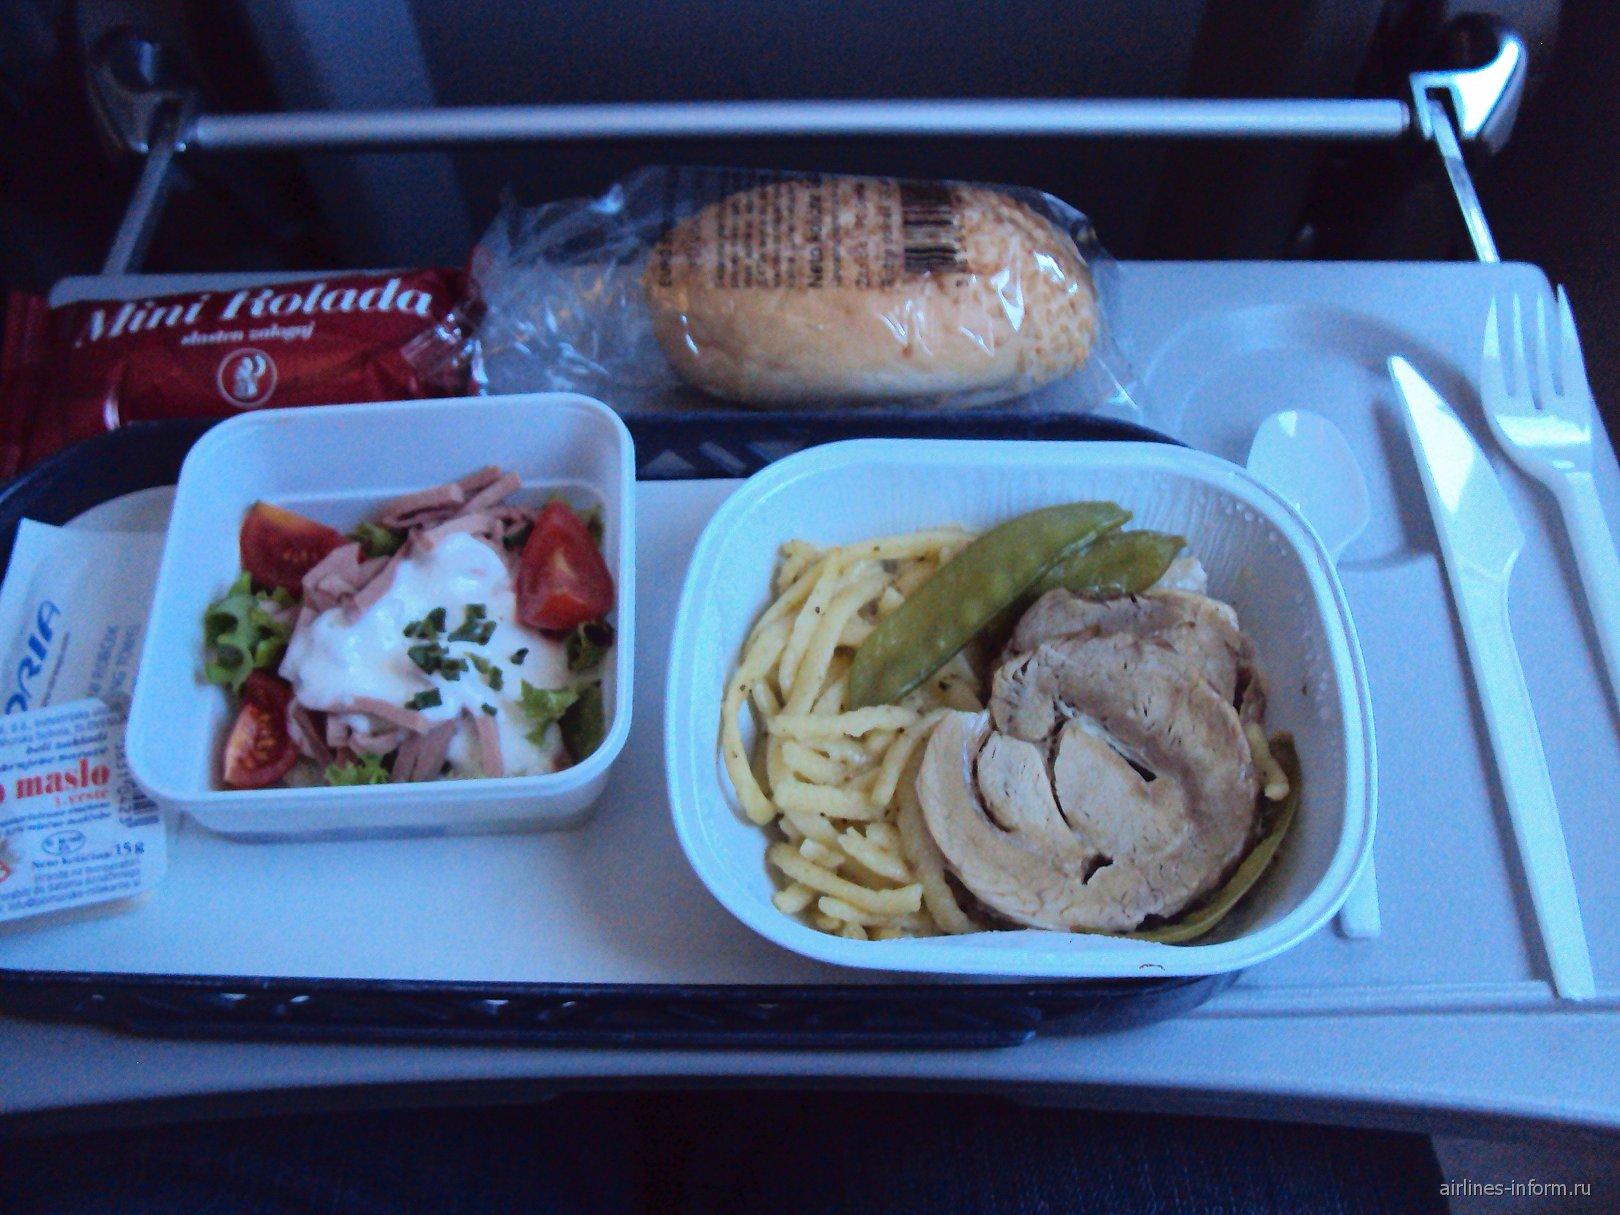 Питание на рейсе Москва-Любляна авиакомпании Adria Airways